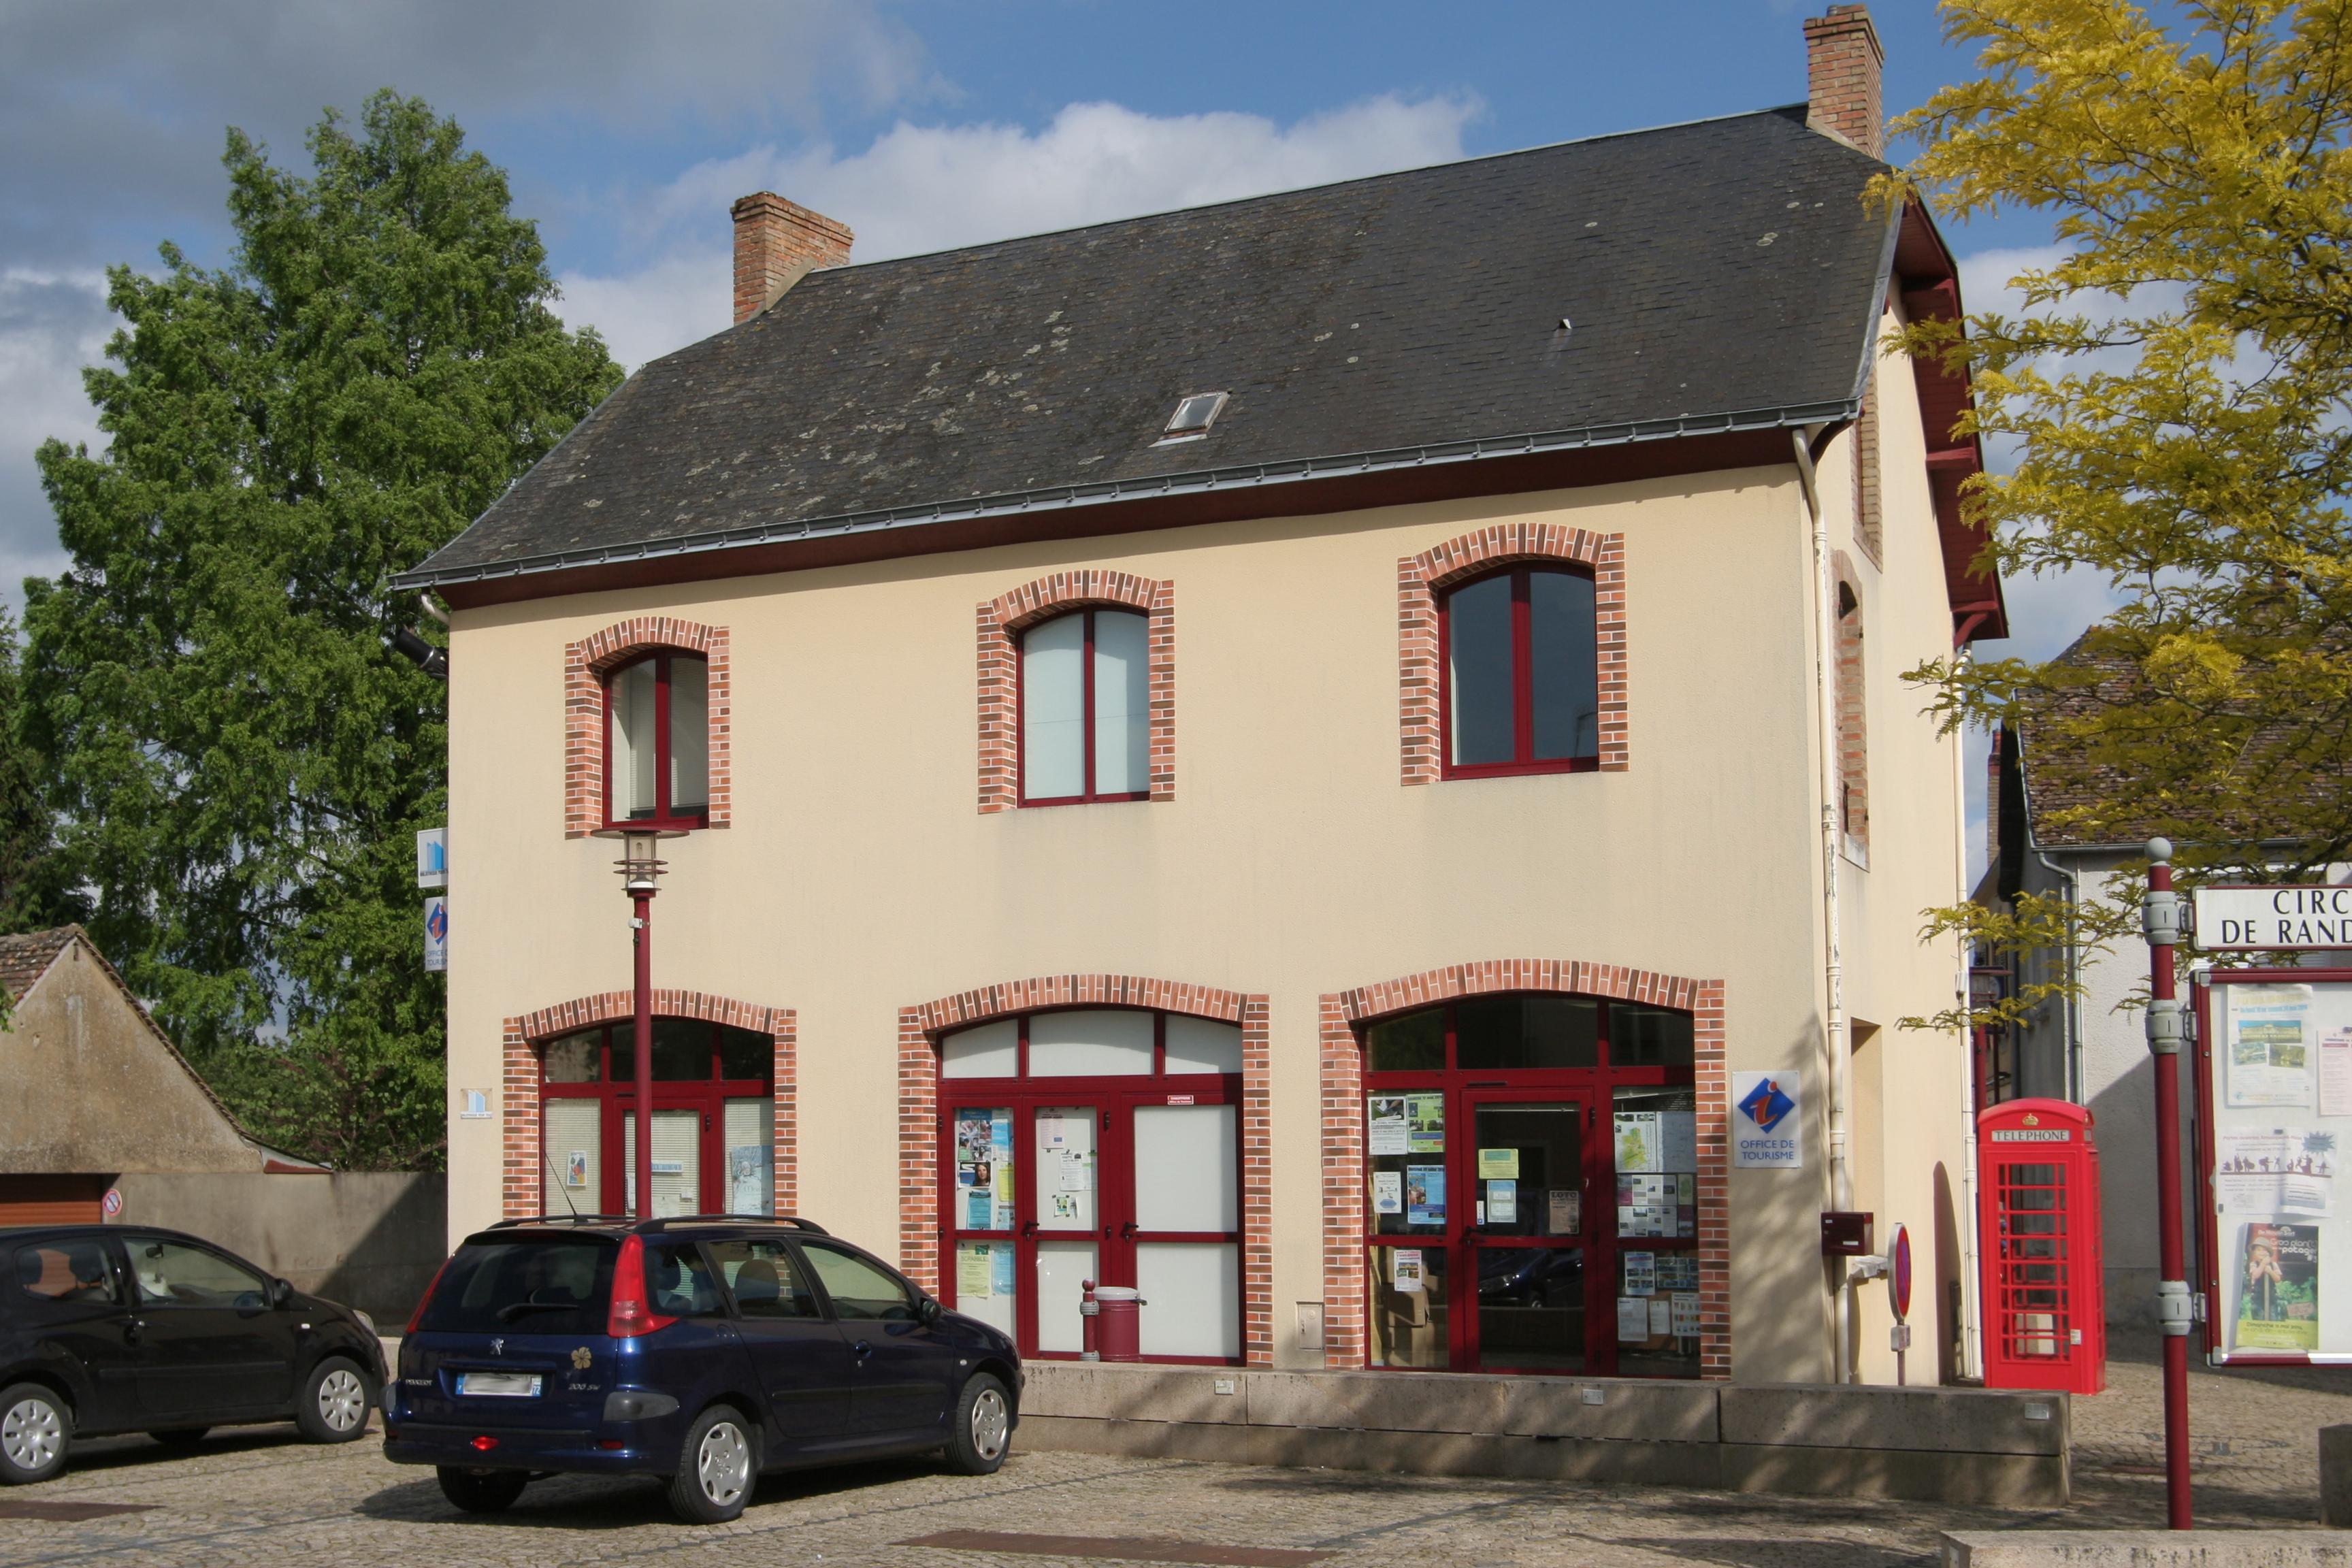 File champagn office du tourisme jpg wikimedia commons - Office du tourisme champagne ...